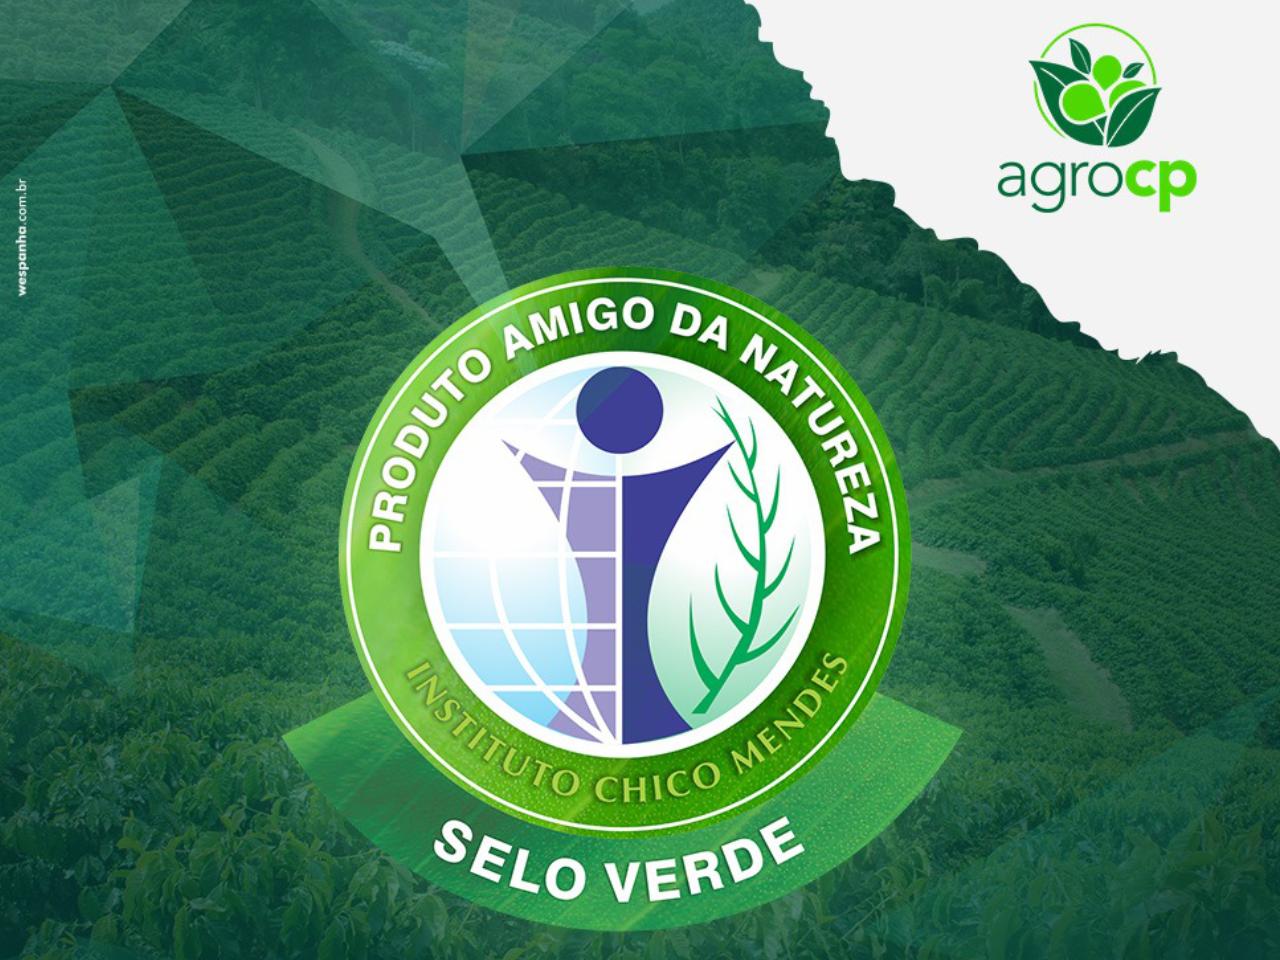 AgroCP é selo verde